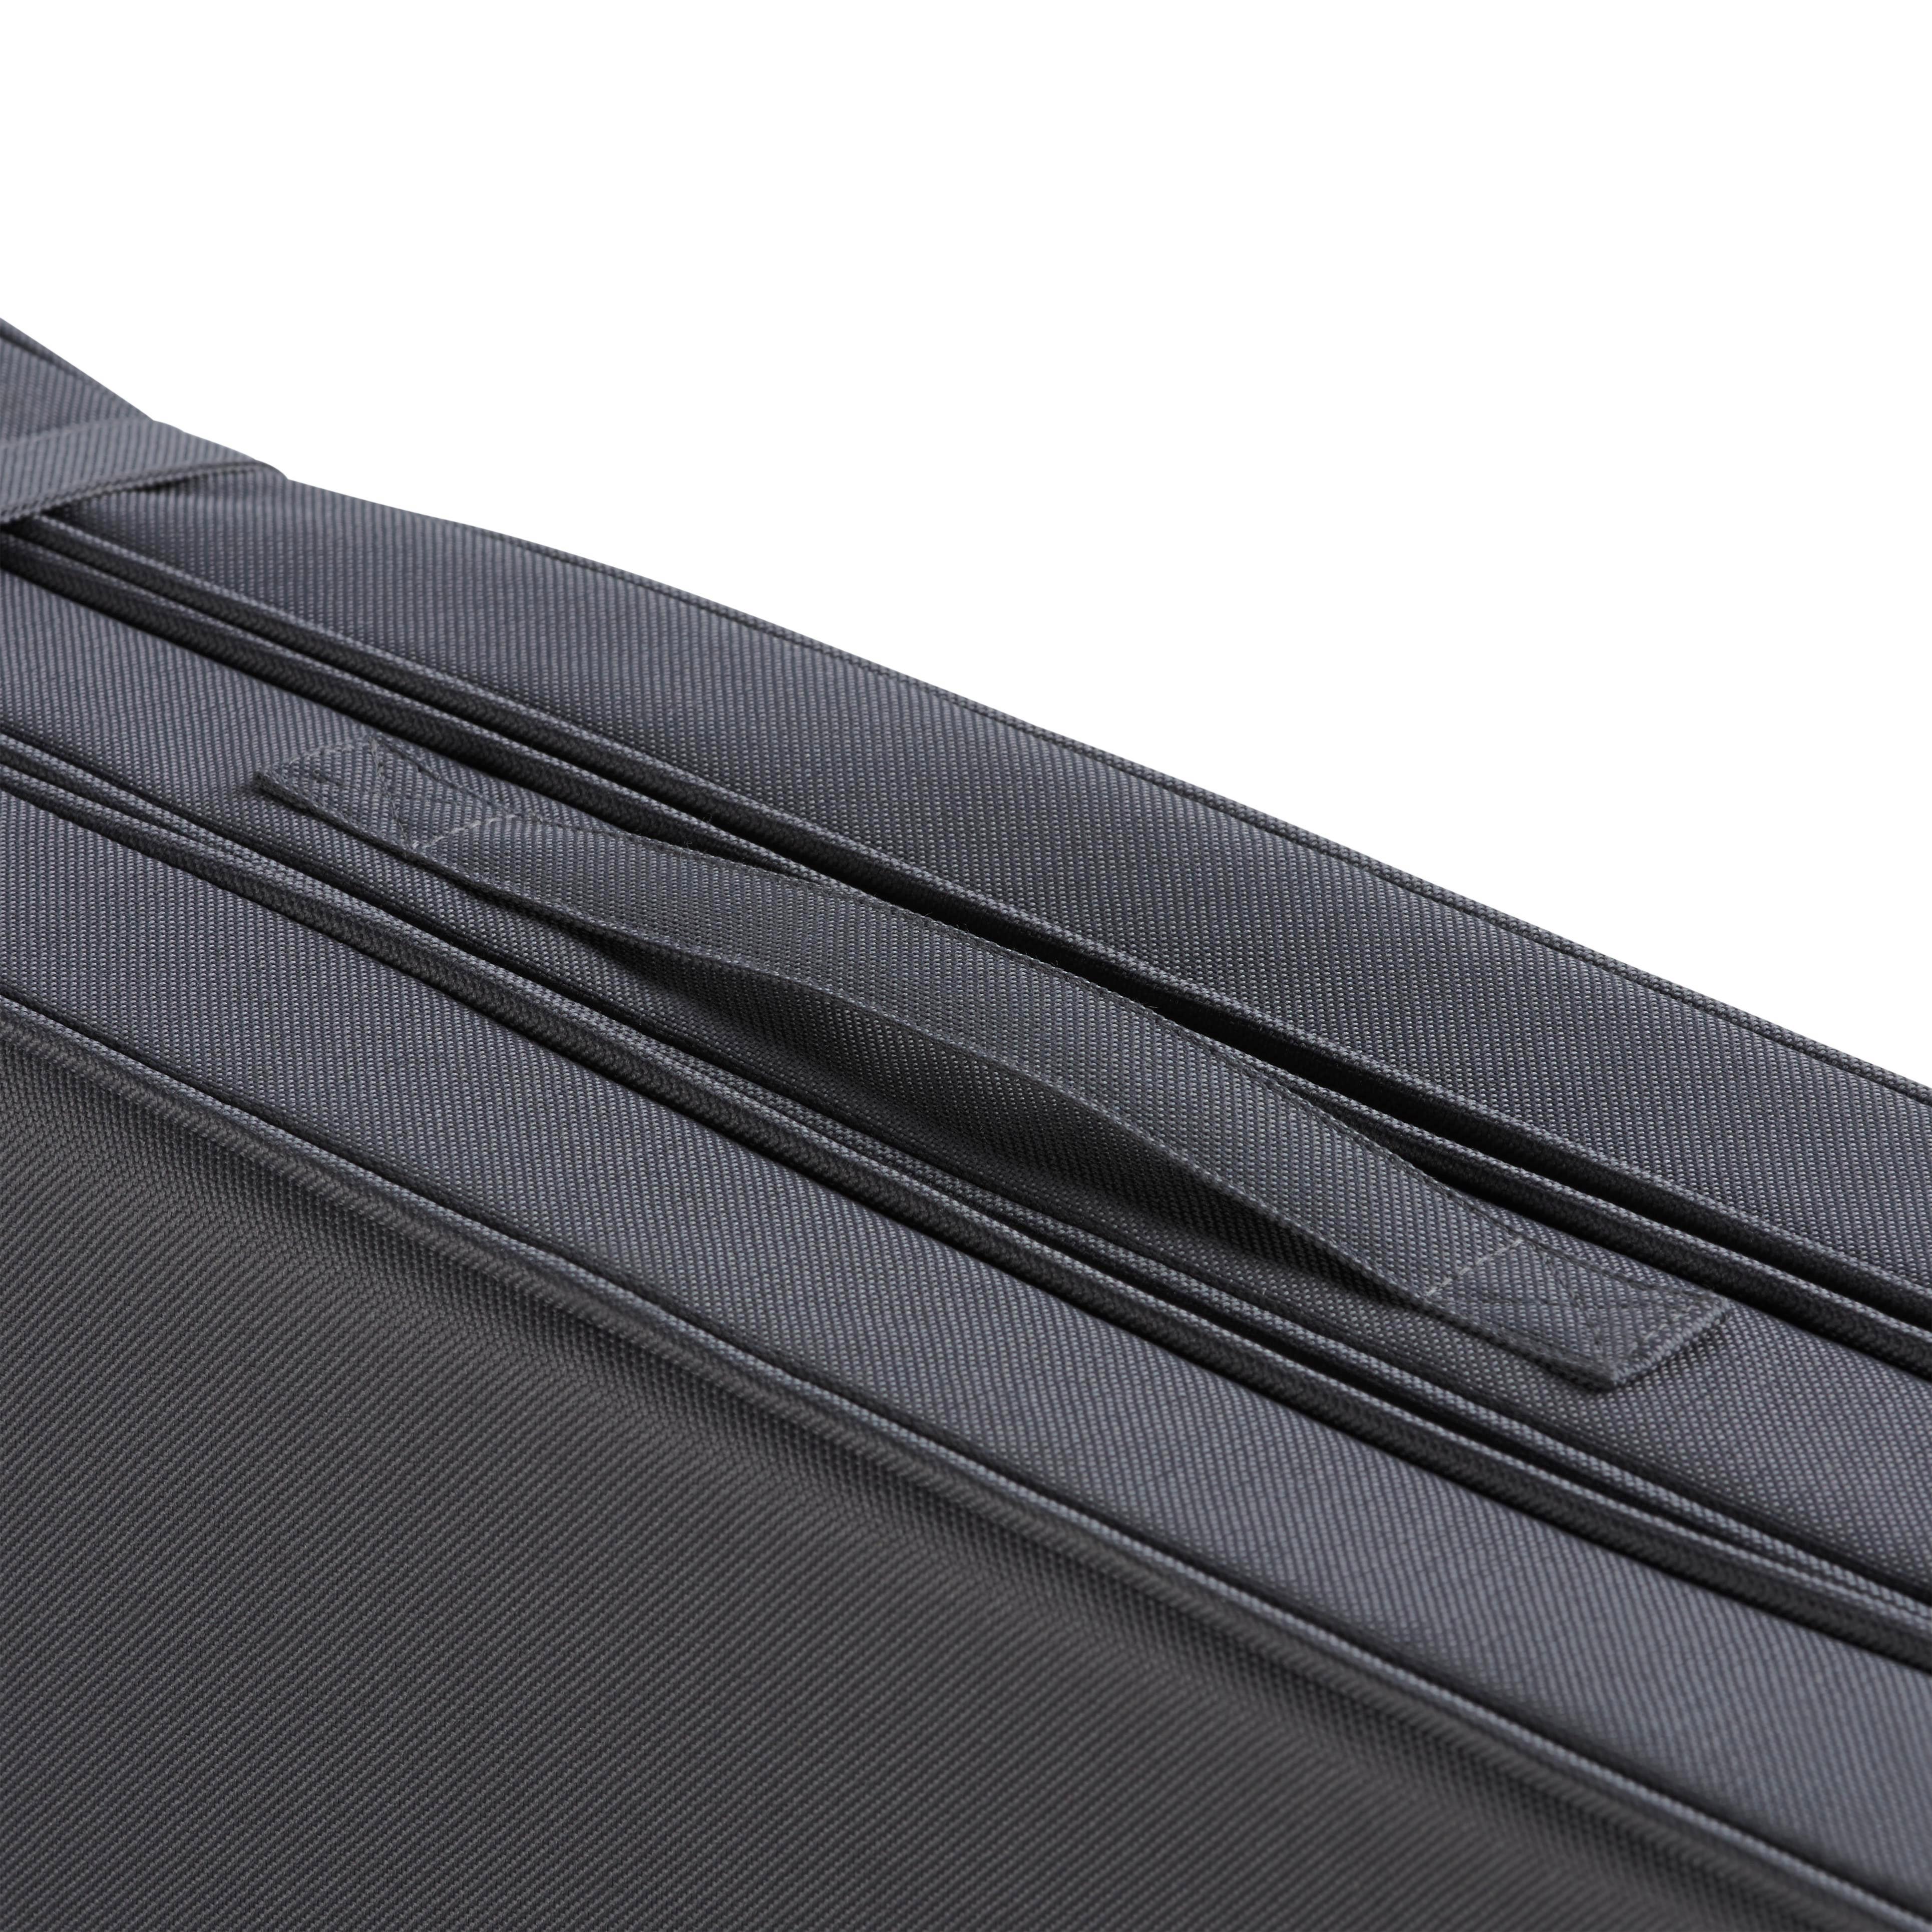 Liegenauflage Polly - Grau, MODERN, Textil (174/58/4cm) - MÖMAX modern living